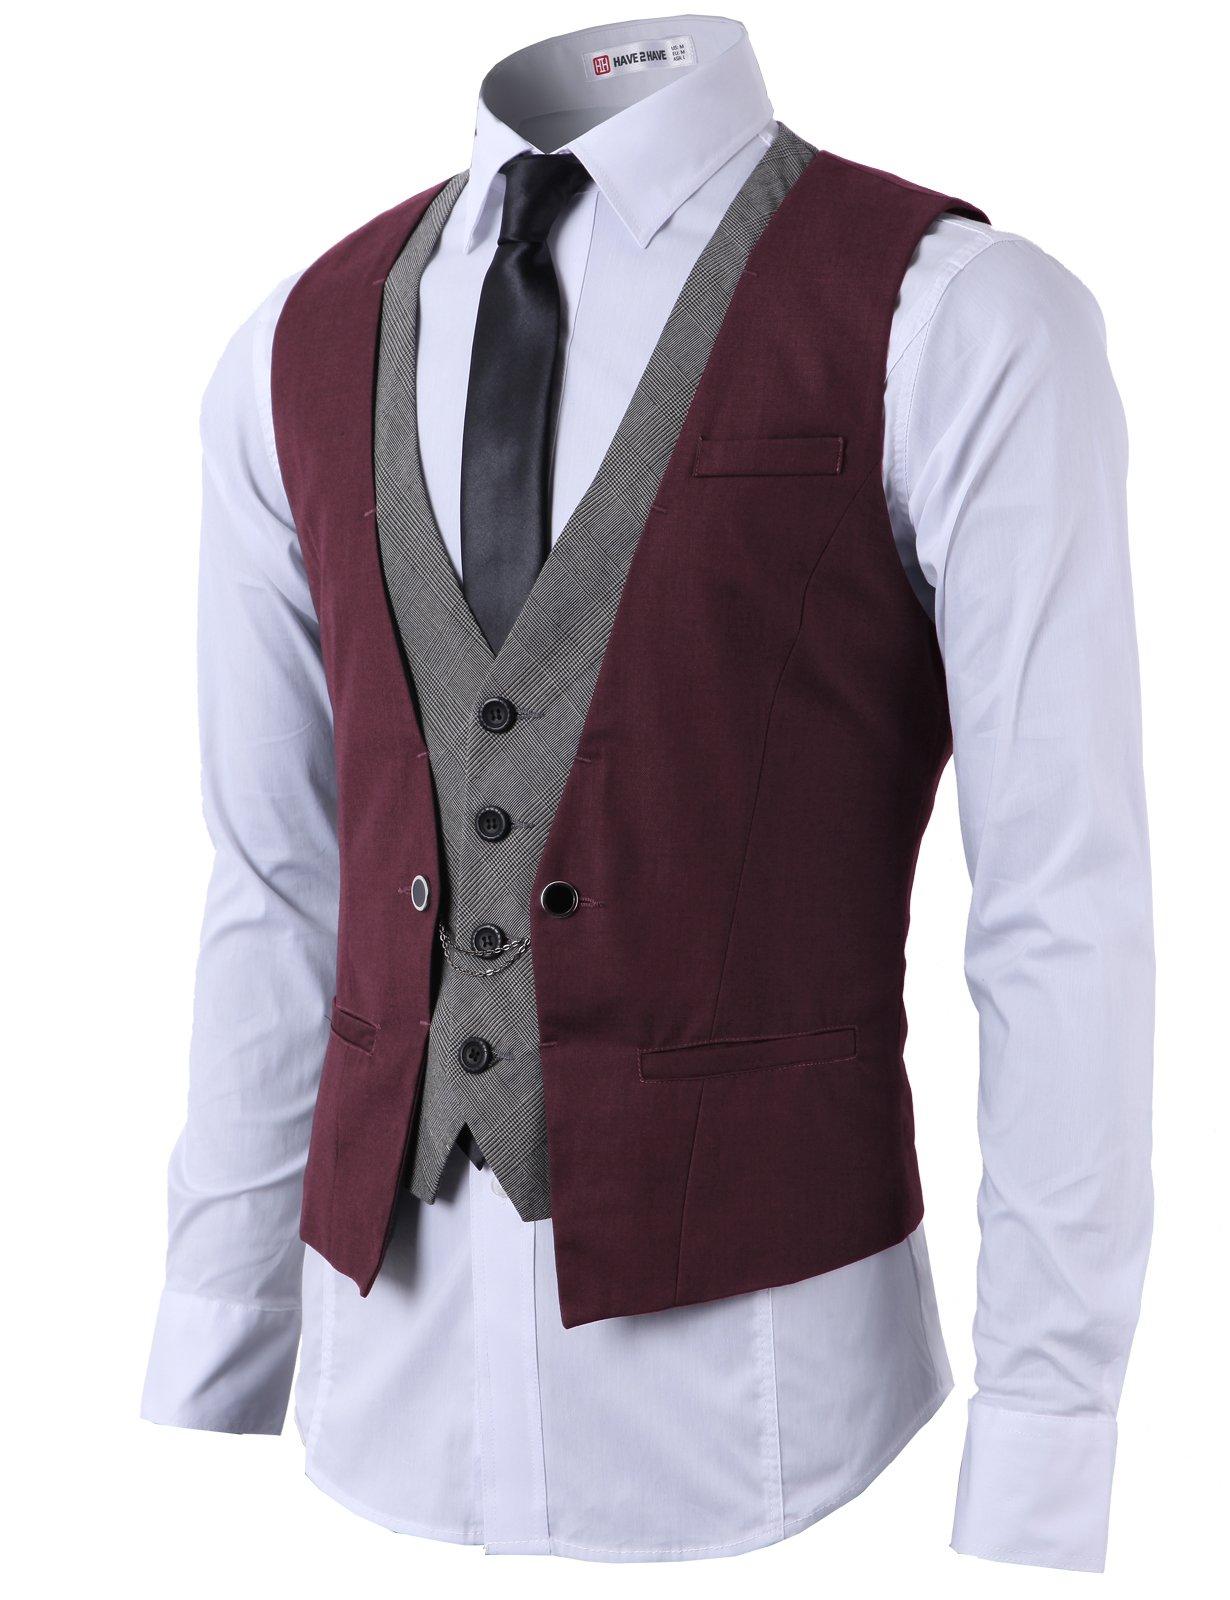 H2H Mens Fashion Slim Fit Chain Point Business Suit Layered Vest Wine US 3XL/Asia 4XL (CMOV01)